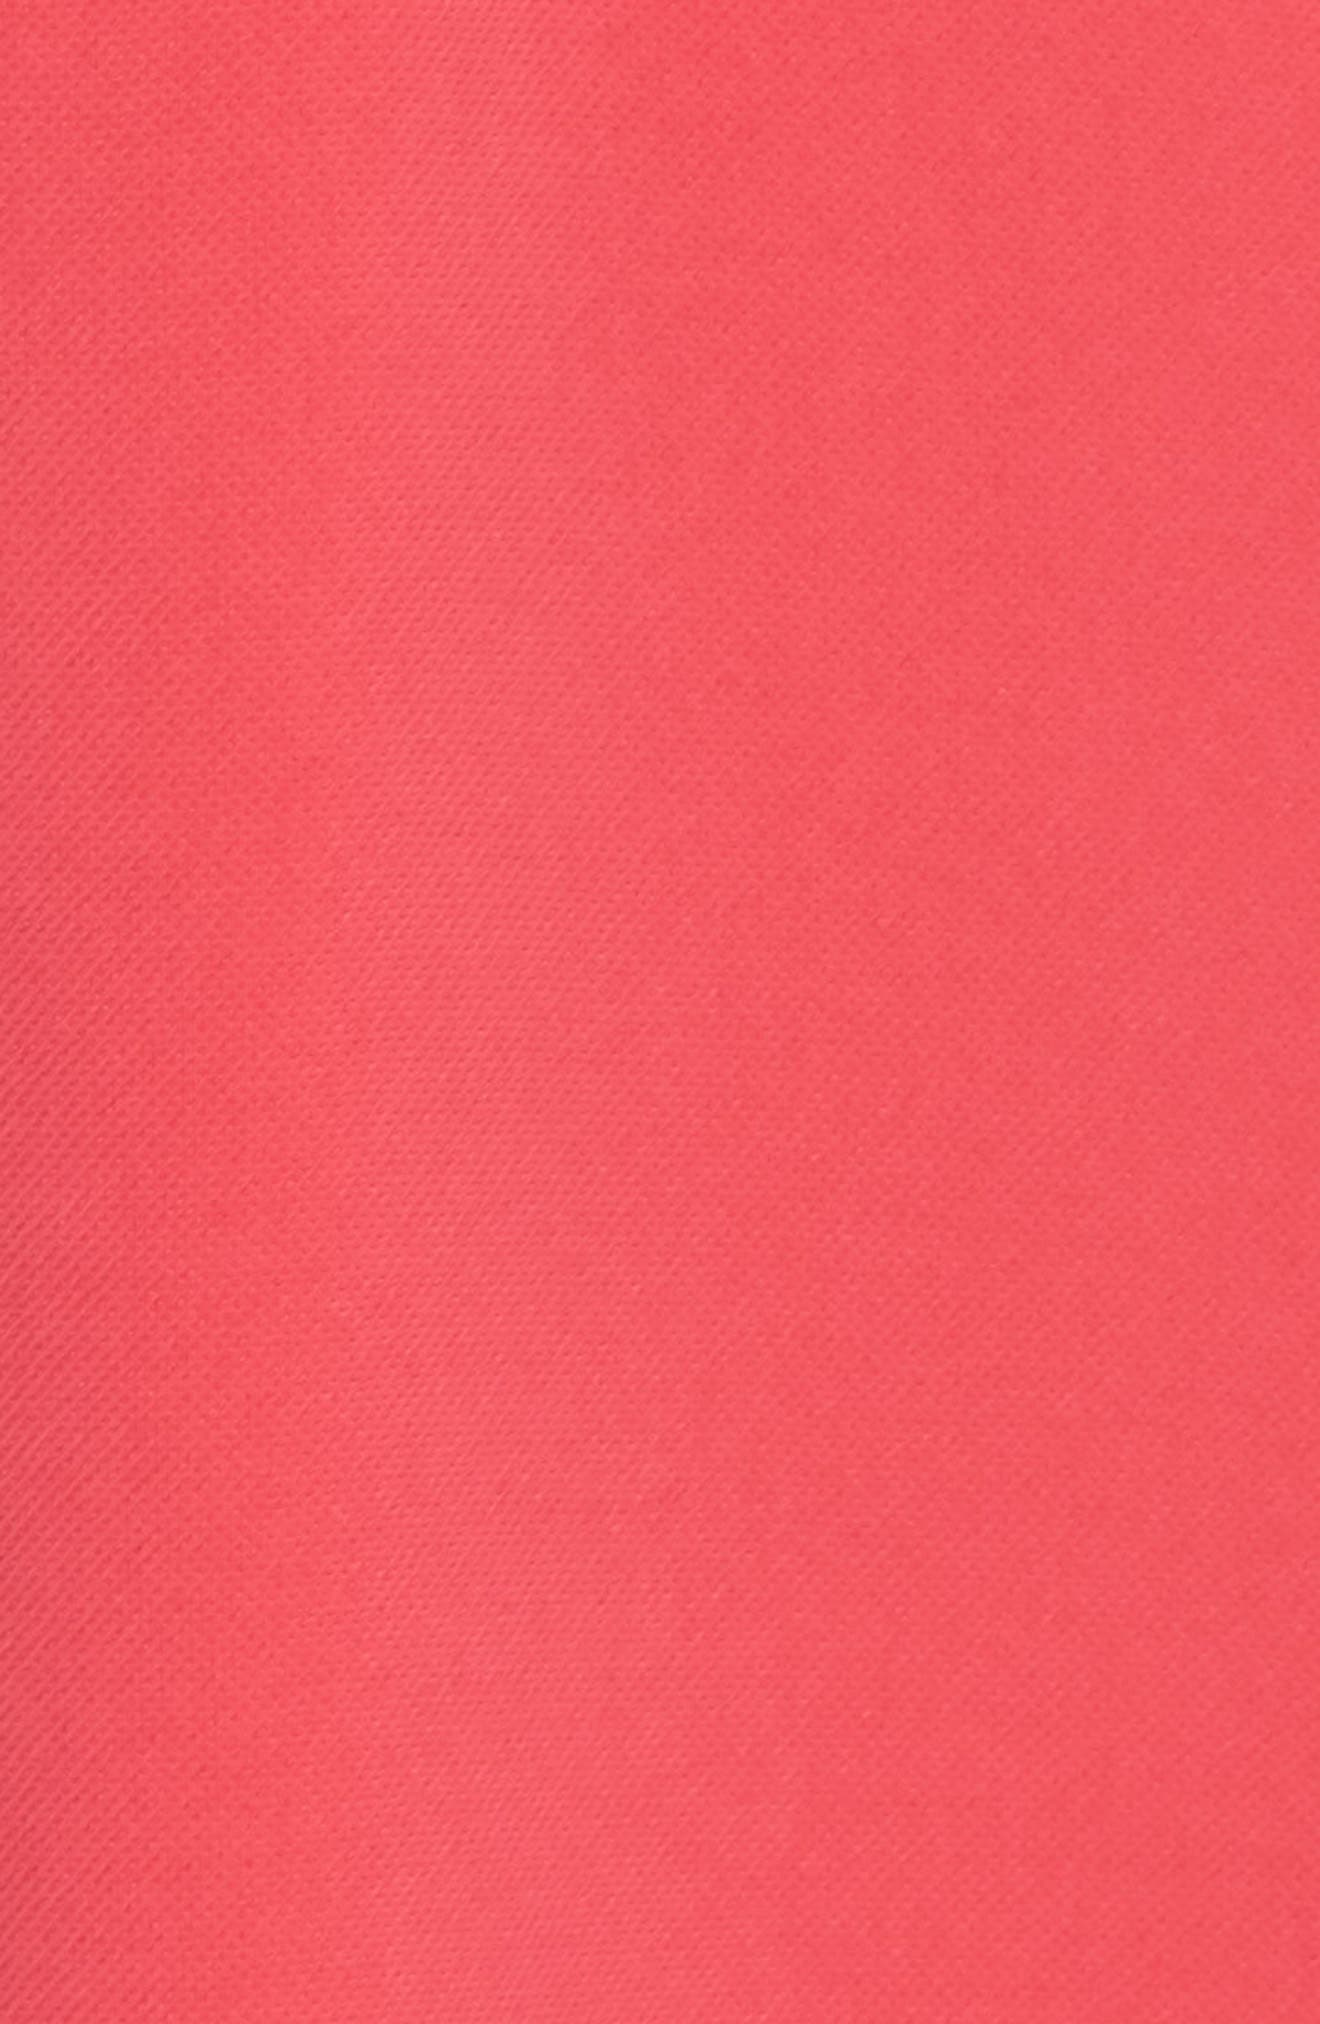 Crepe Popover High/Low Dress,                             Alternate thumbnail 6, color,                             654